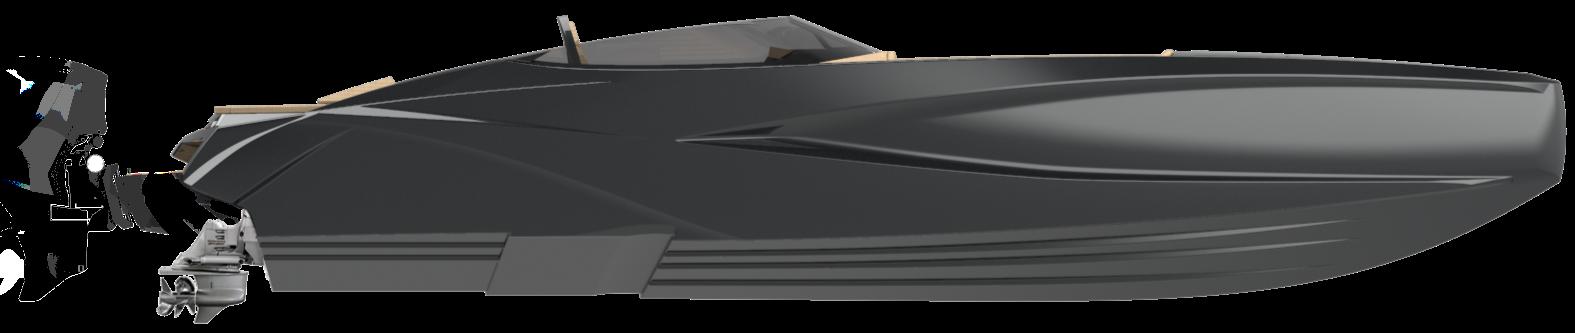 DIPIU' 900 F